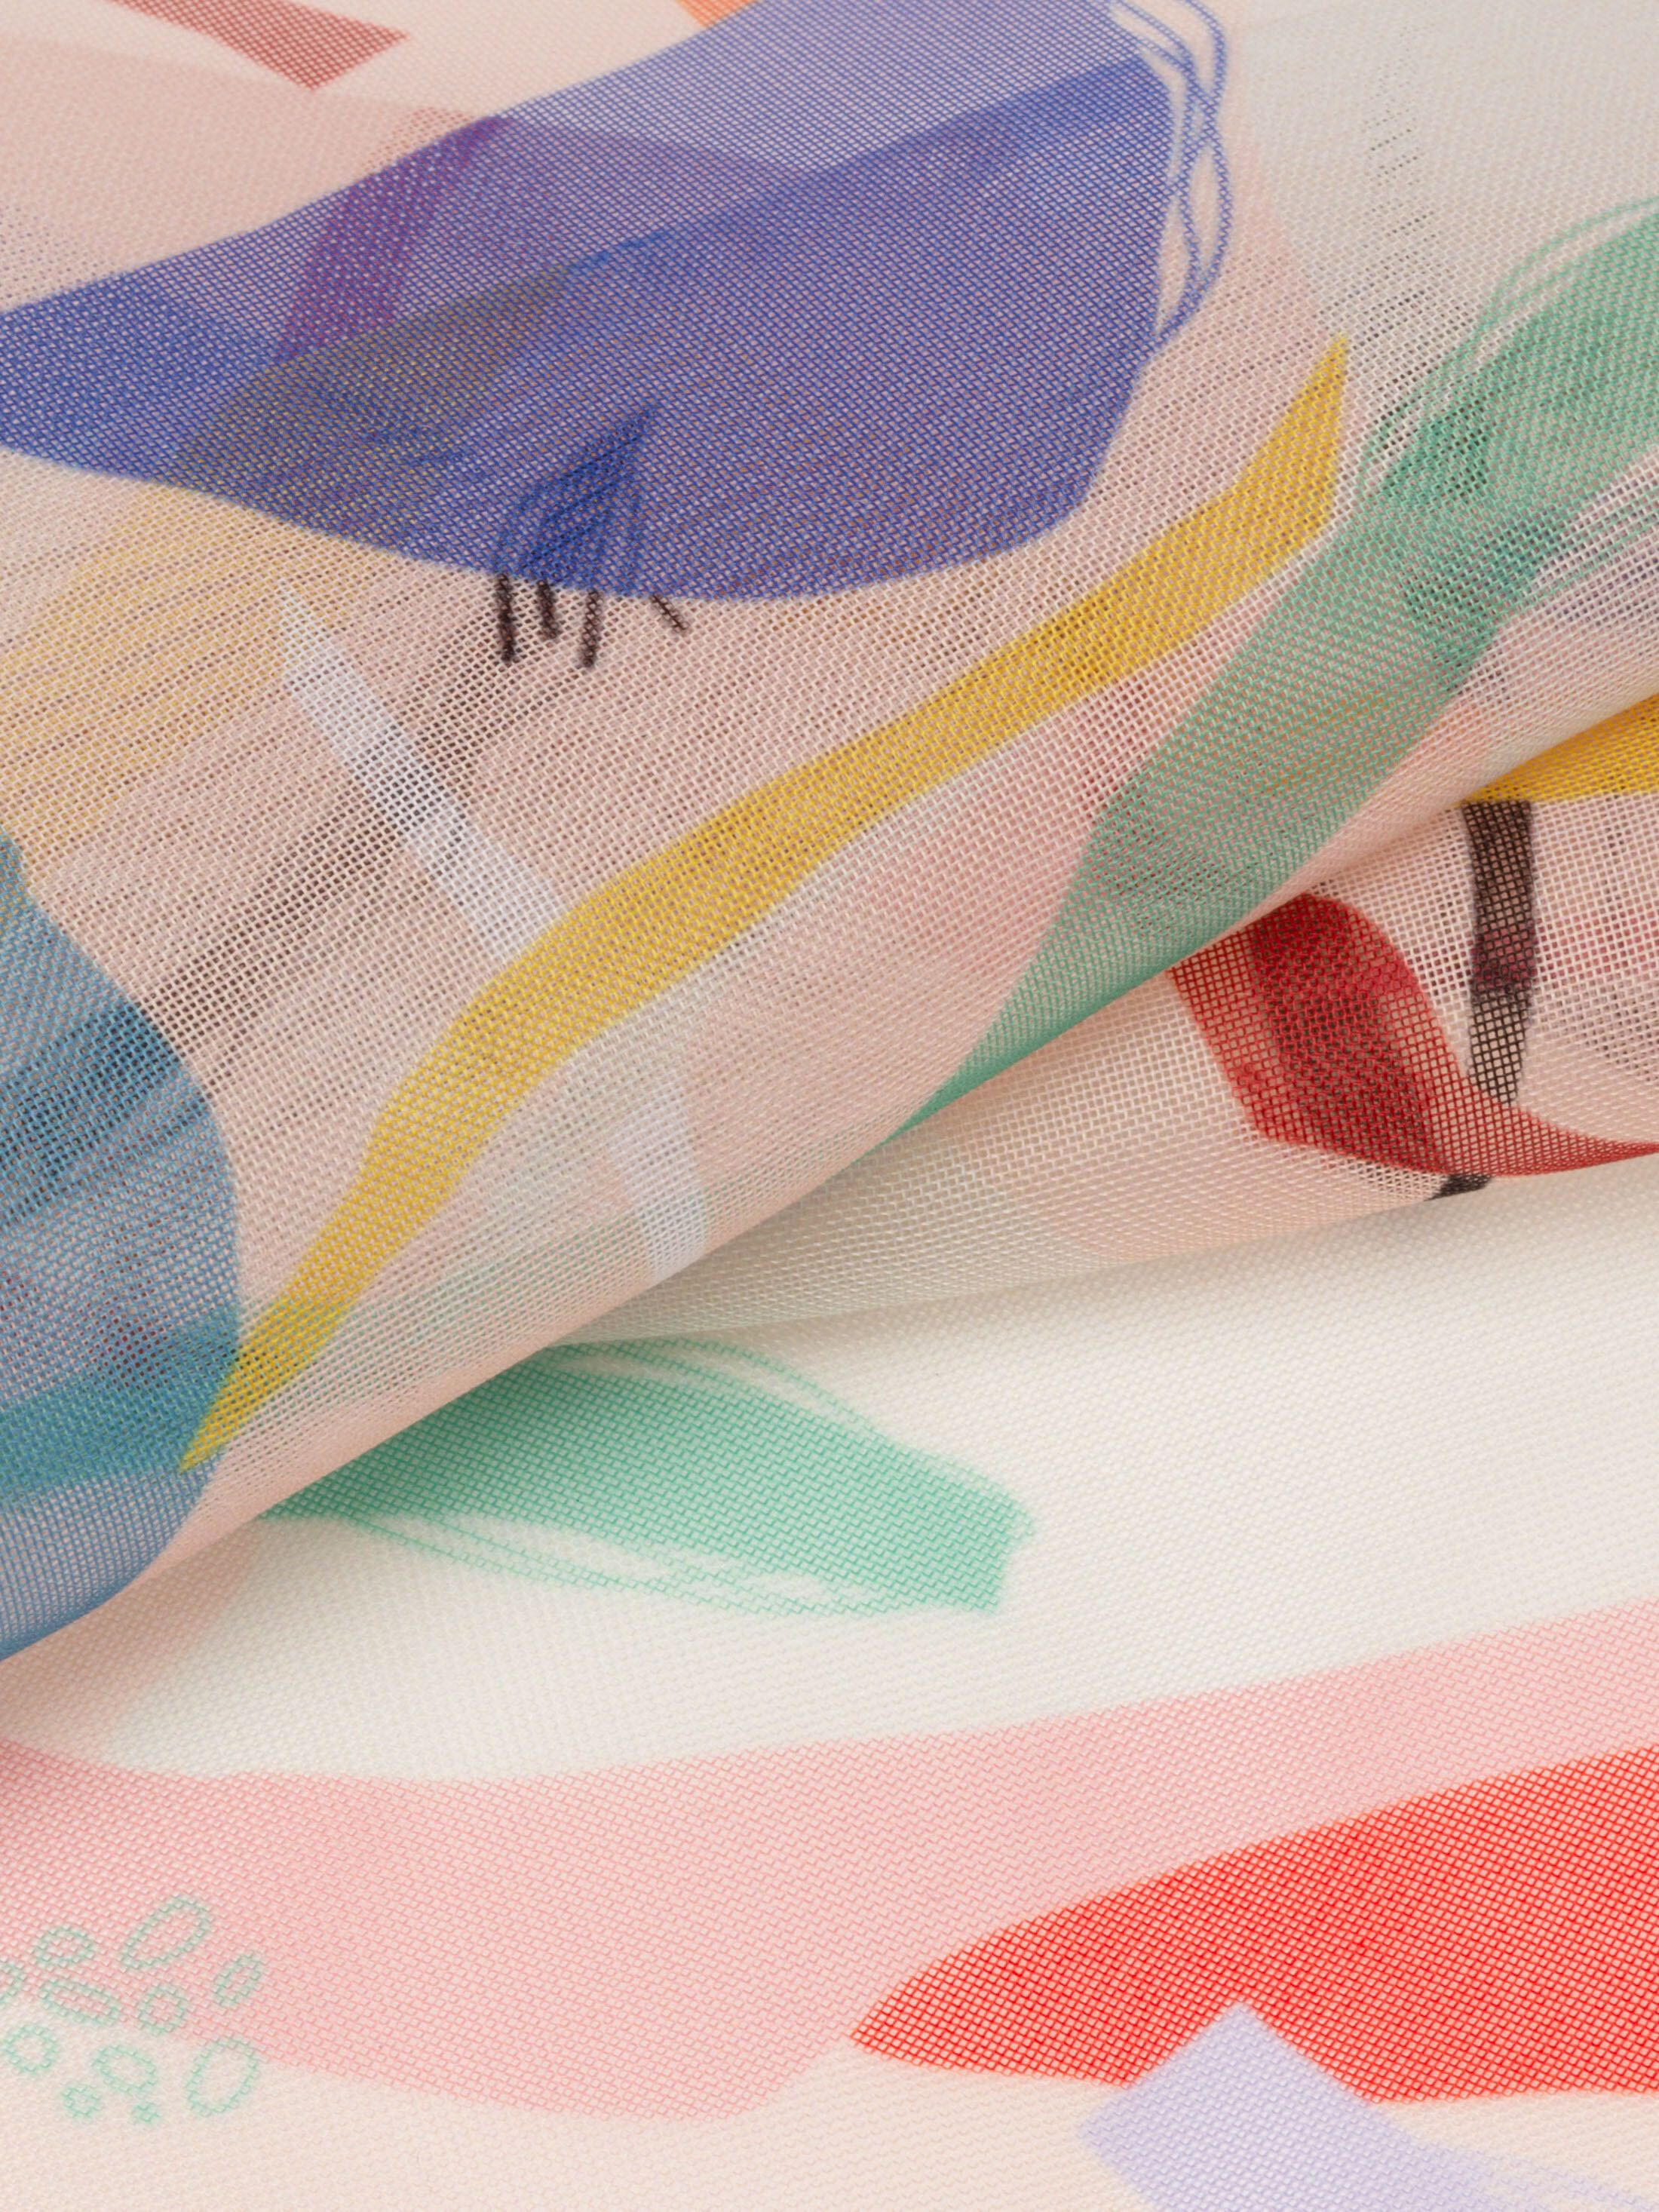 digital printing on Volando Voile fabric